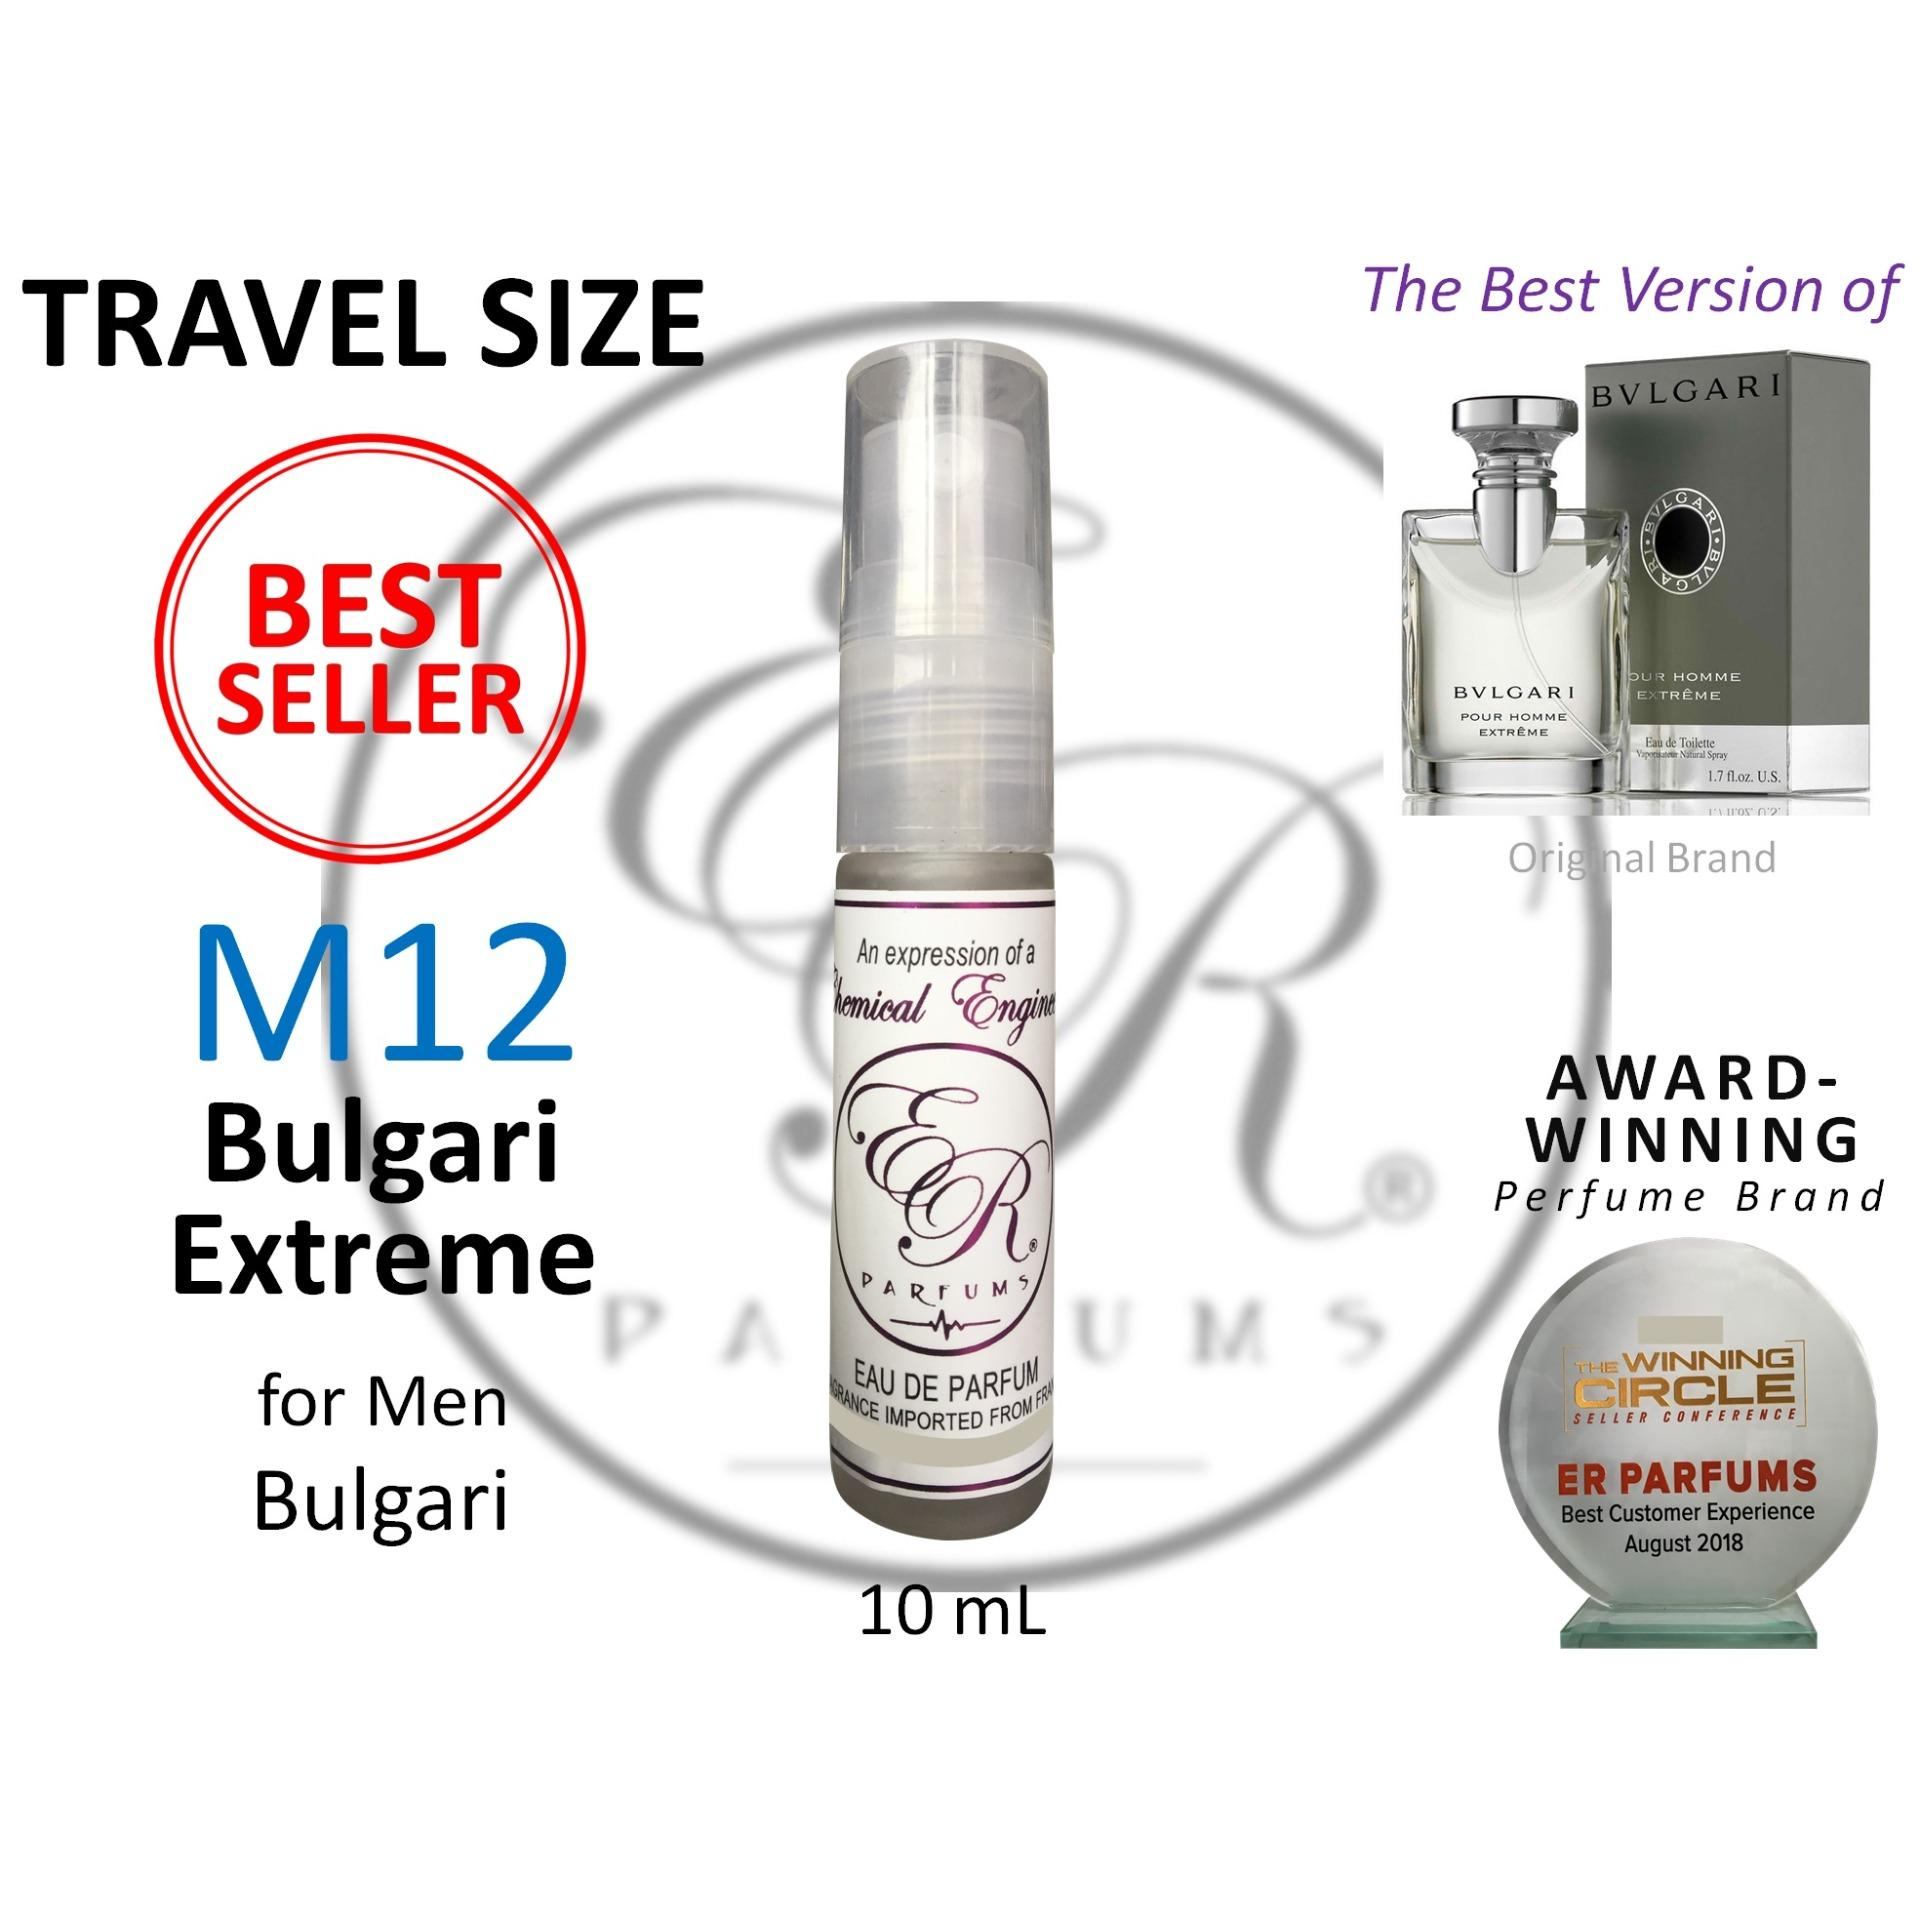 7ca598728cebd ER PARFUMS M12 Bulgari Extreme for Men by Bulgari 1 piece 10 ml TRAVEL SIZE  -